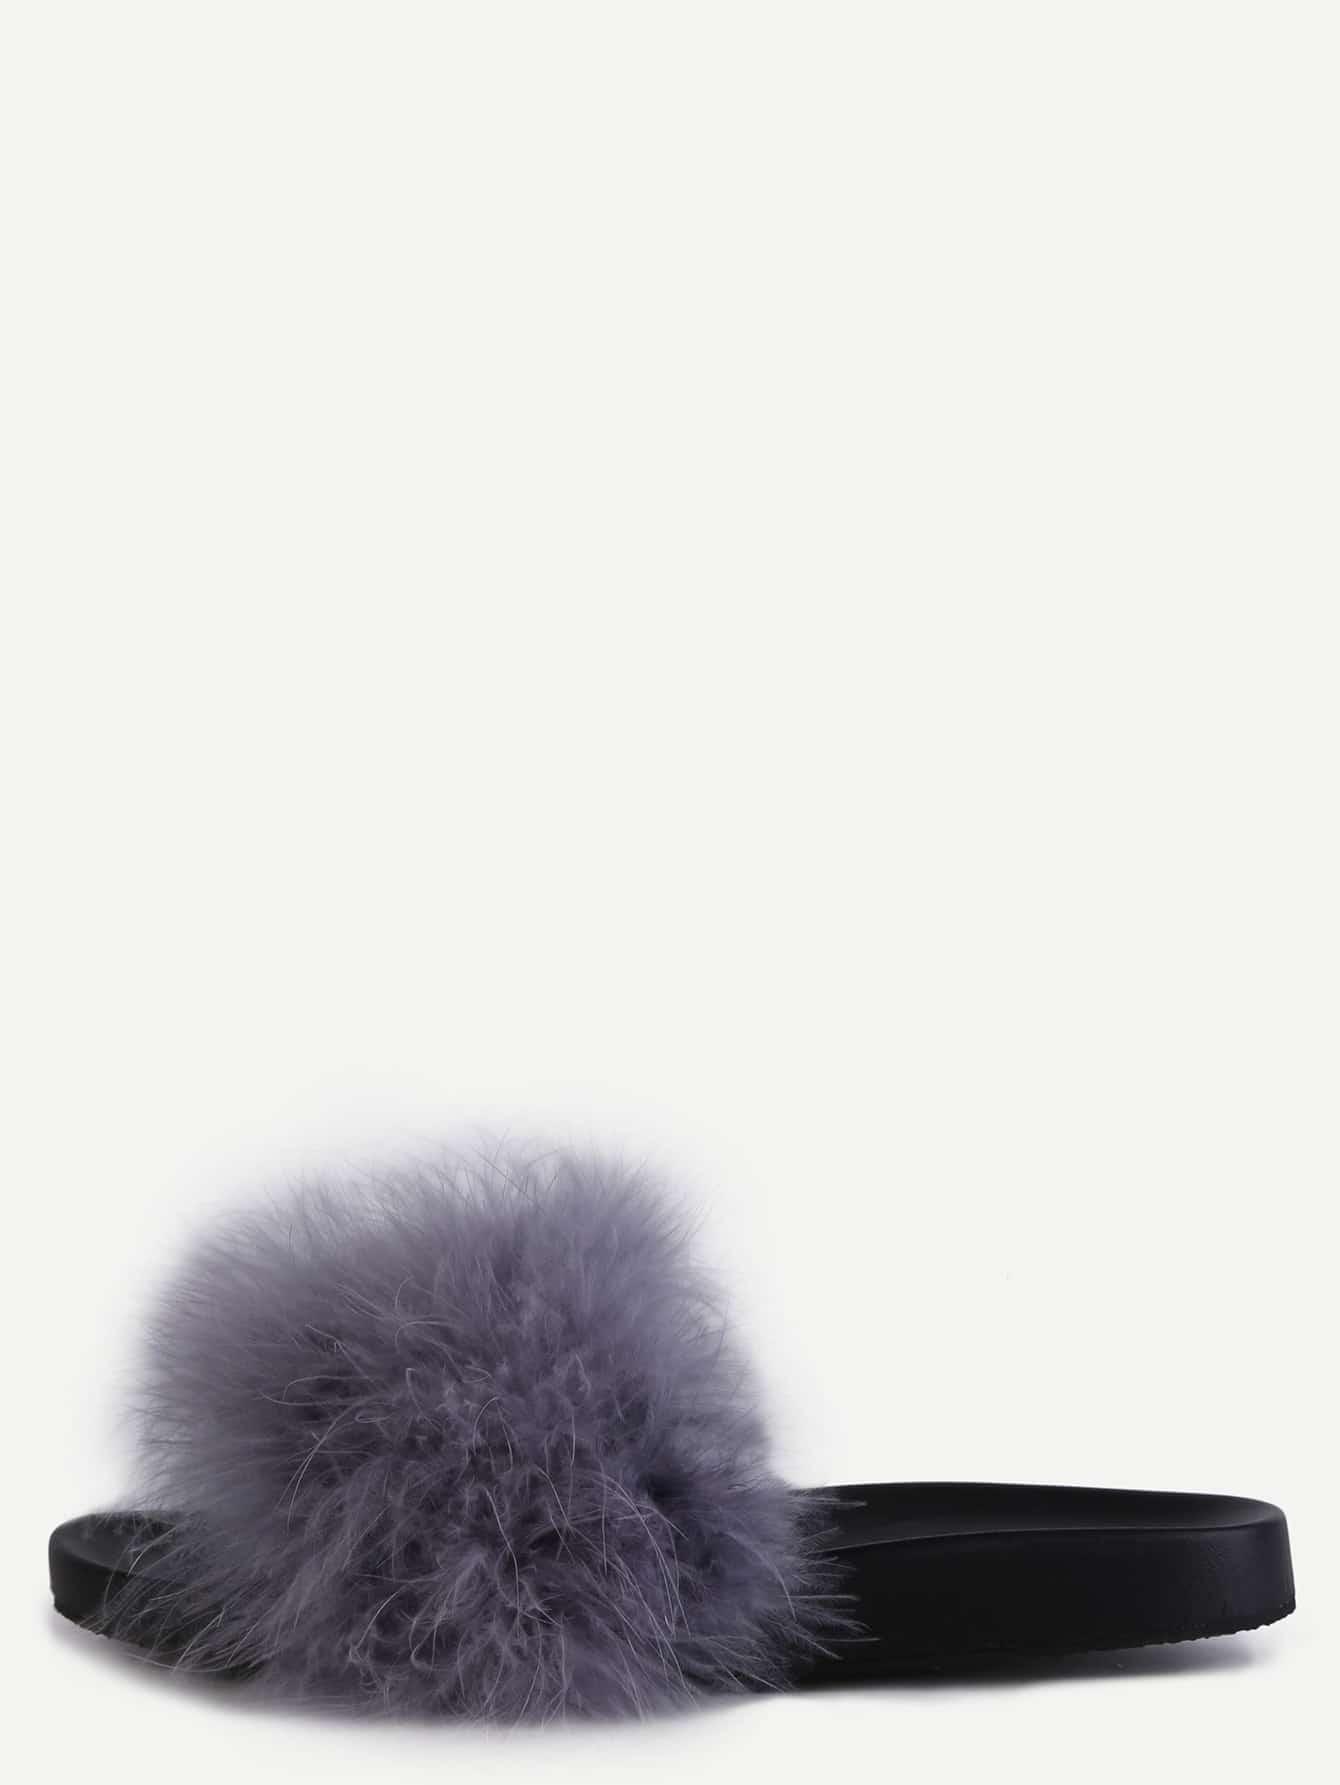 Grey Faux Leather Rubber Peep Toe Flip Flops Fur Lined Casual Cute Sandals.